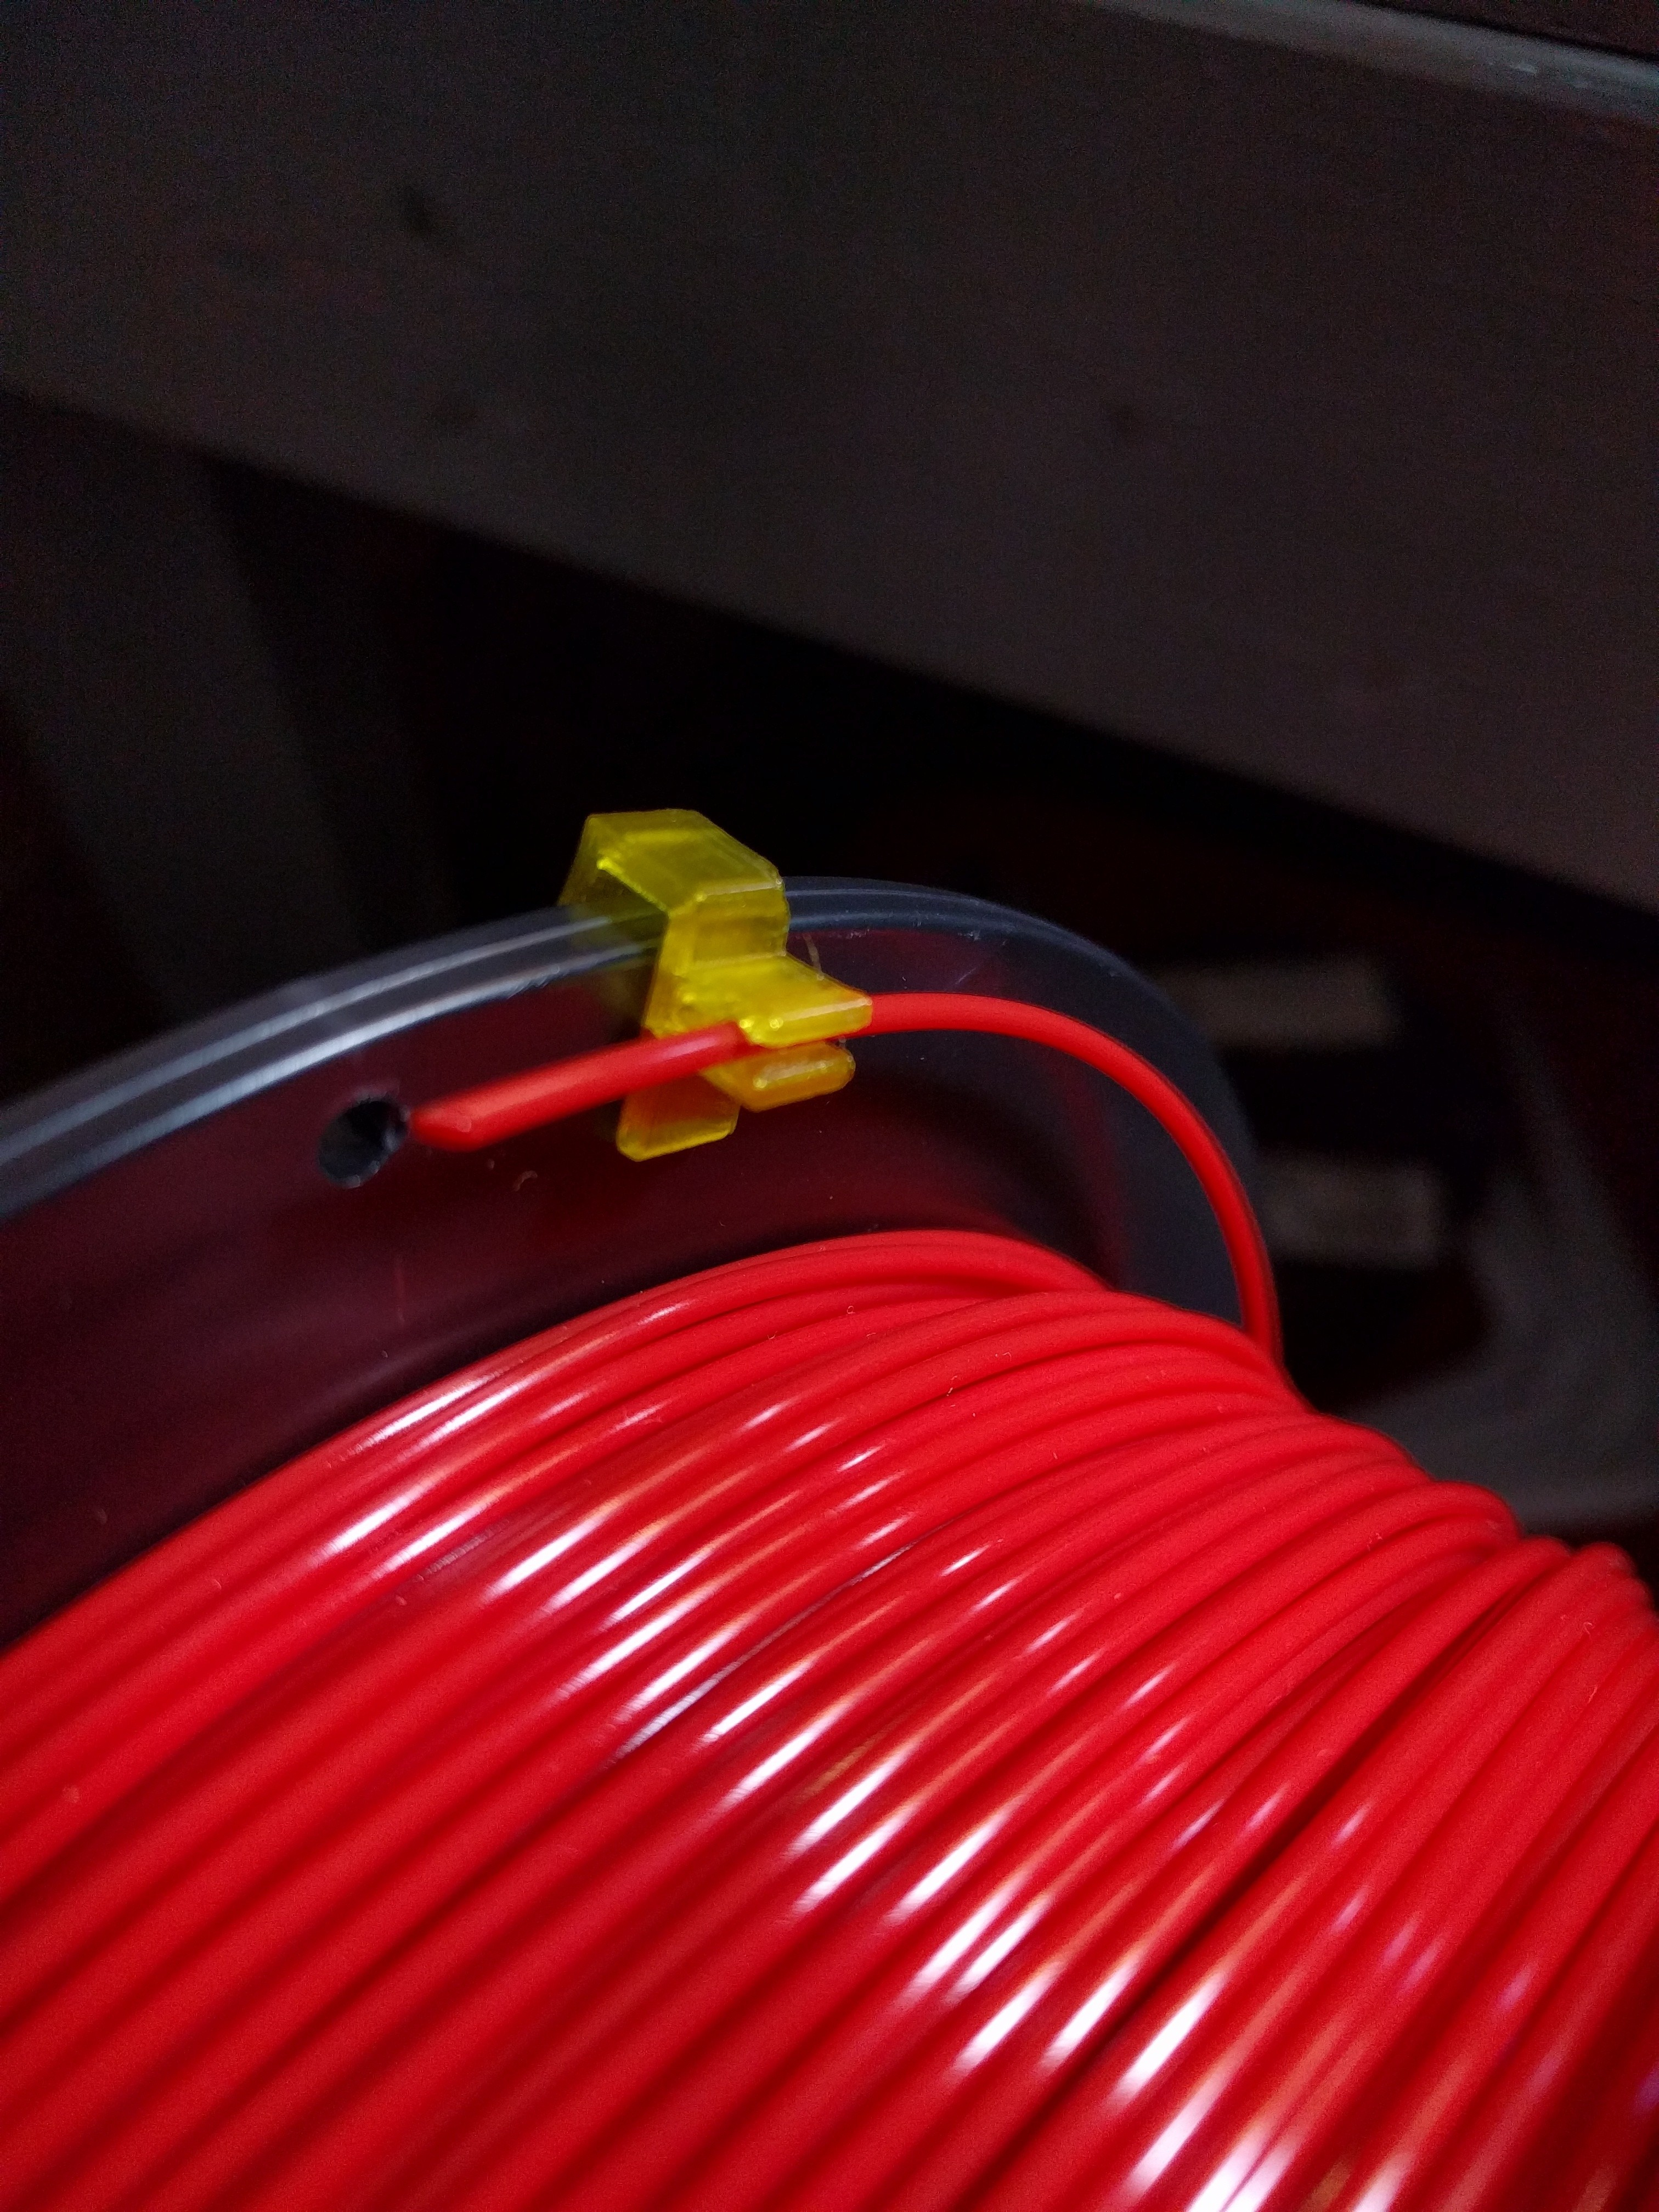 IMG_20170630_001532[1].jpg Télécharger fichier STL gratuit Filament Clip, Filament Holder, Filament Keeper • Plan imprimable en 3D, jwilson484